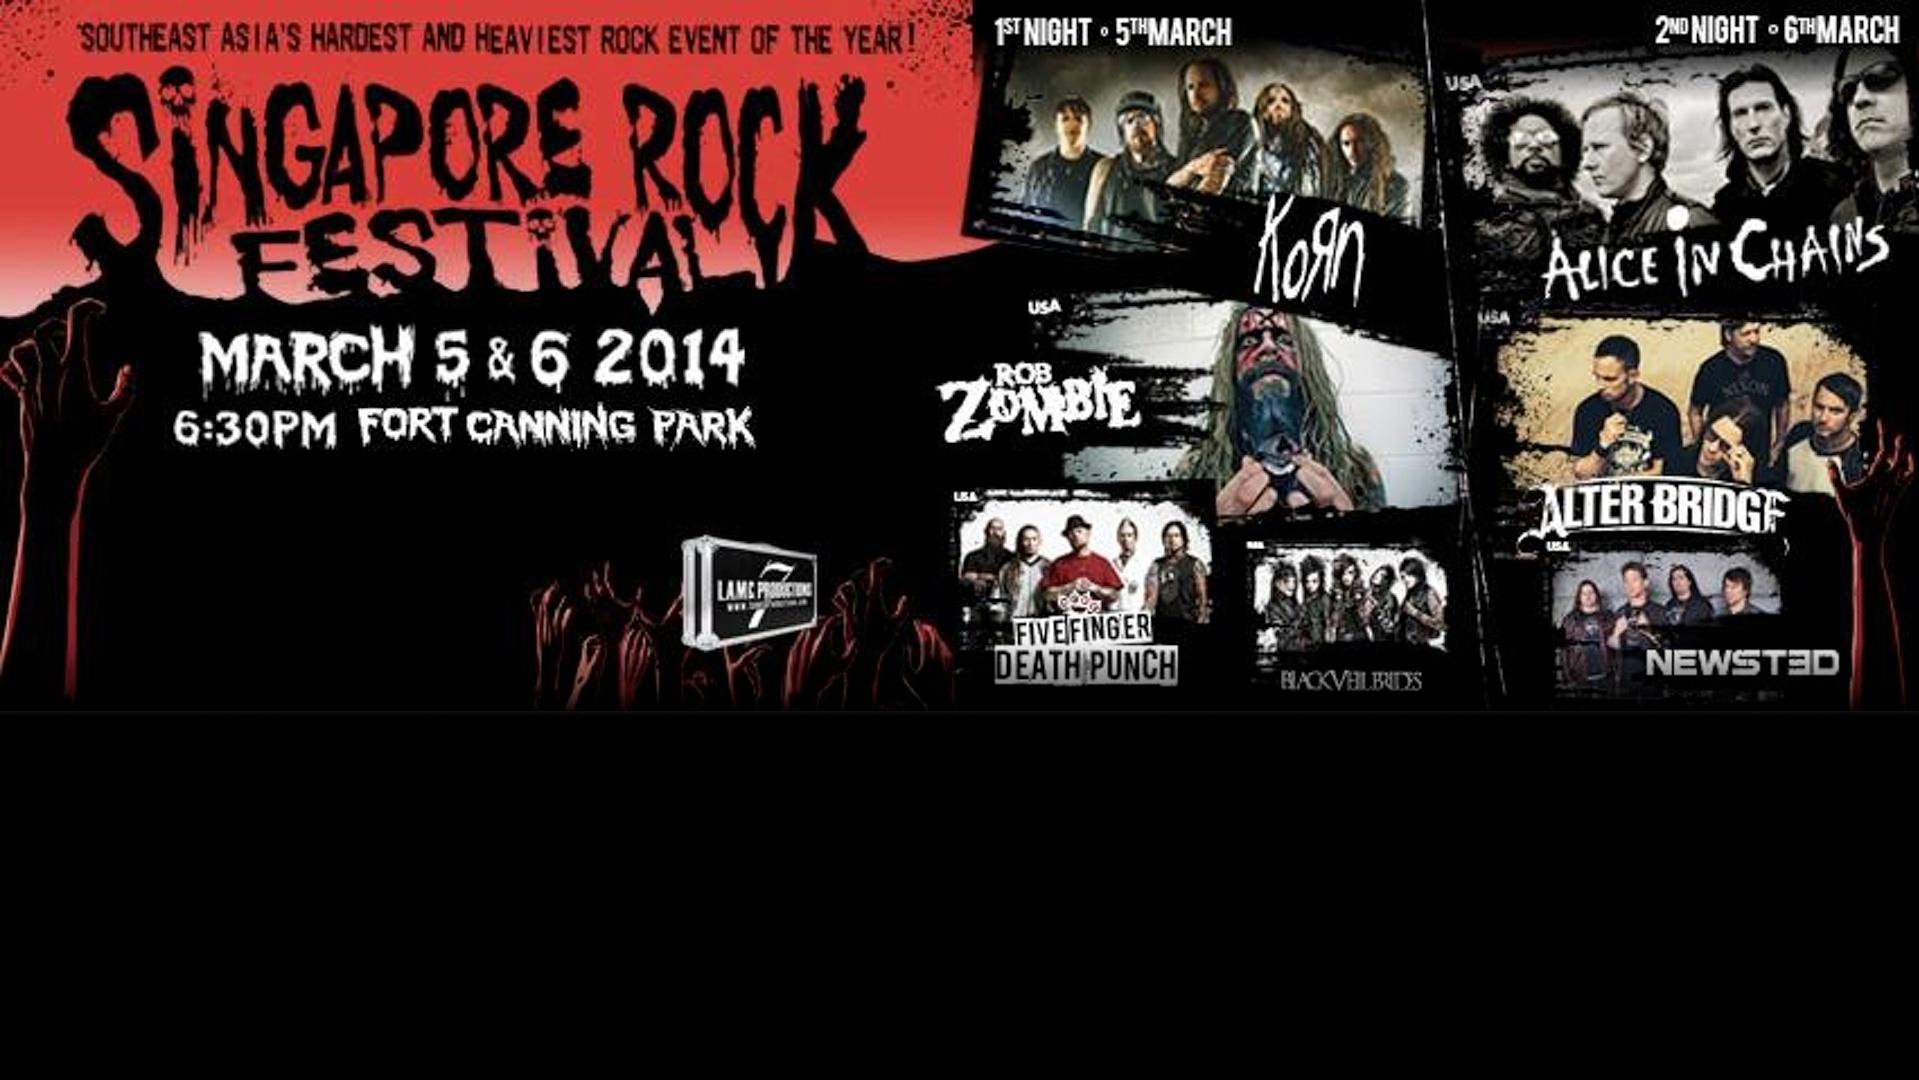 Singapore Rock Festival 2014 (Day 2)